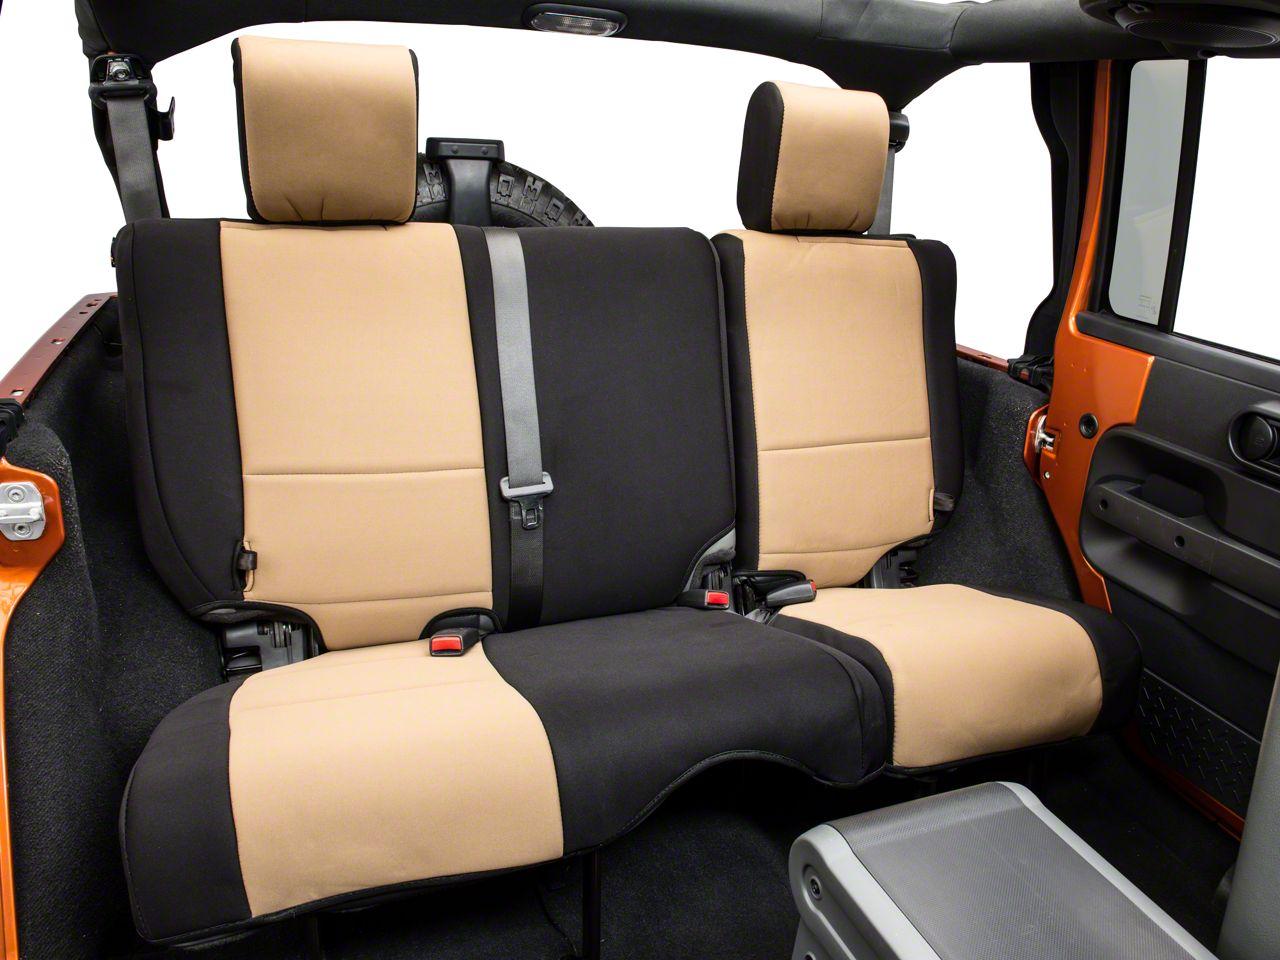 Rugged Ridge Neoprene Rear Seat Cover - Black/Tan (07-18 Jeep Wrangler JK 4 Door)